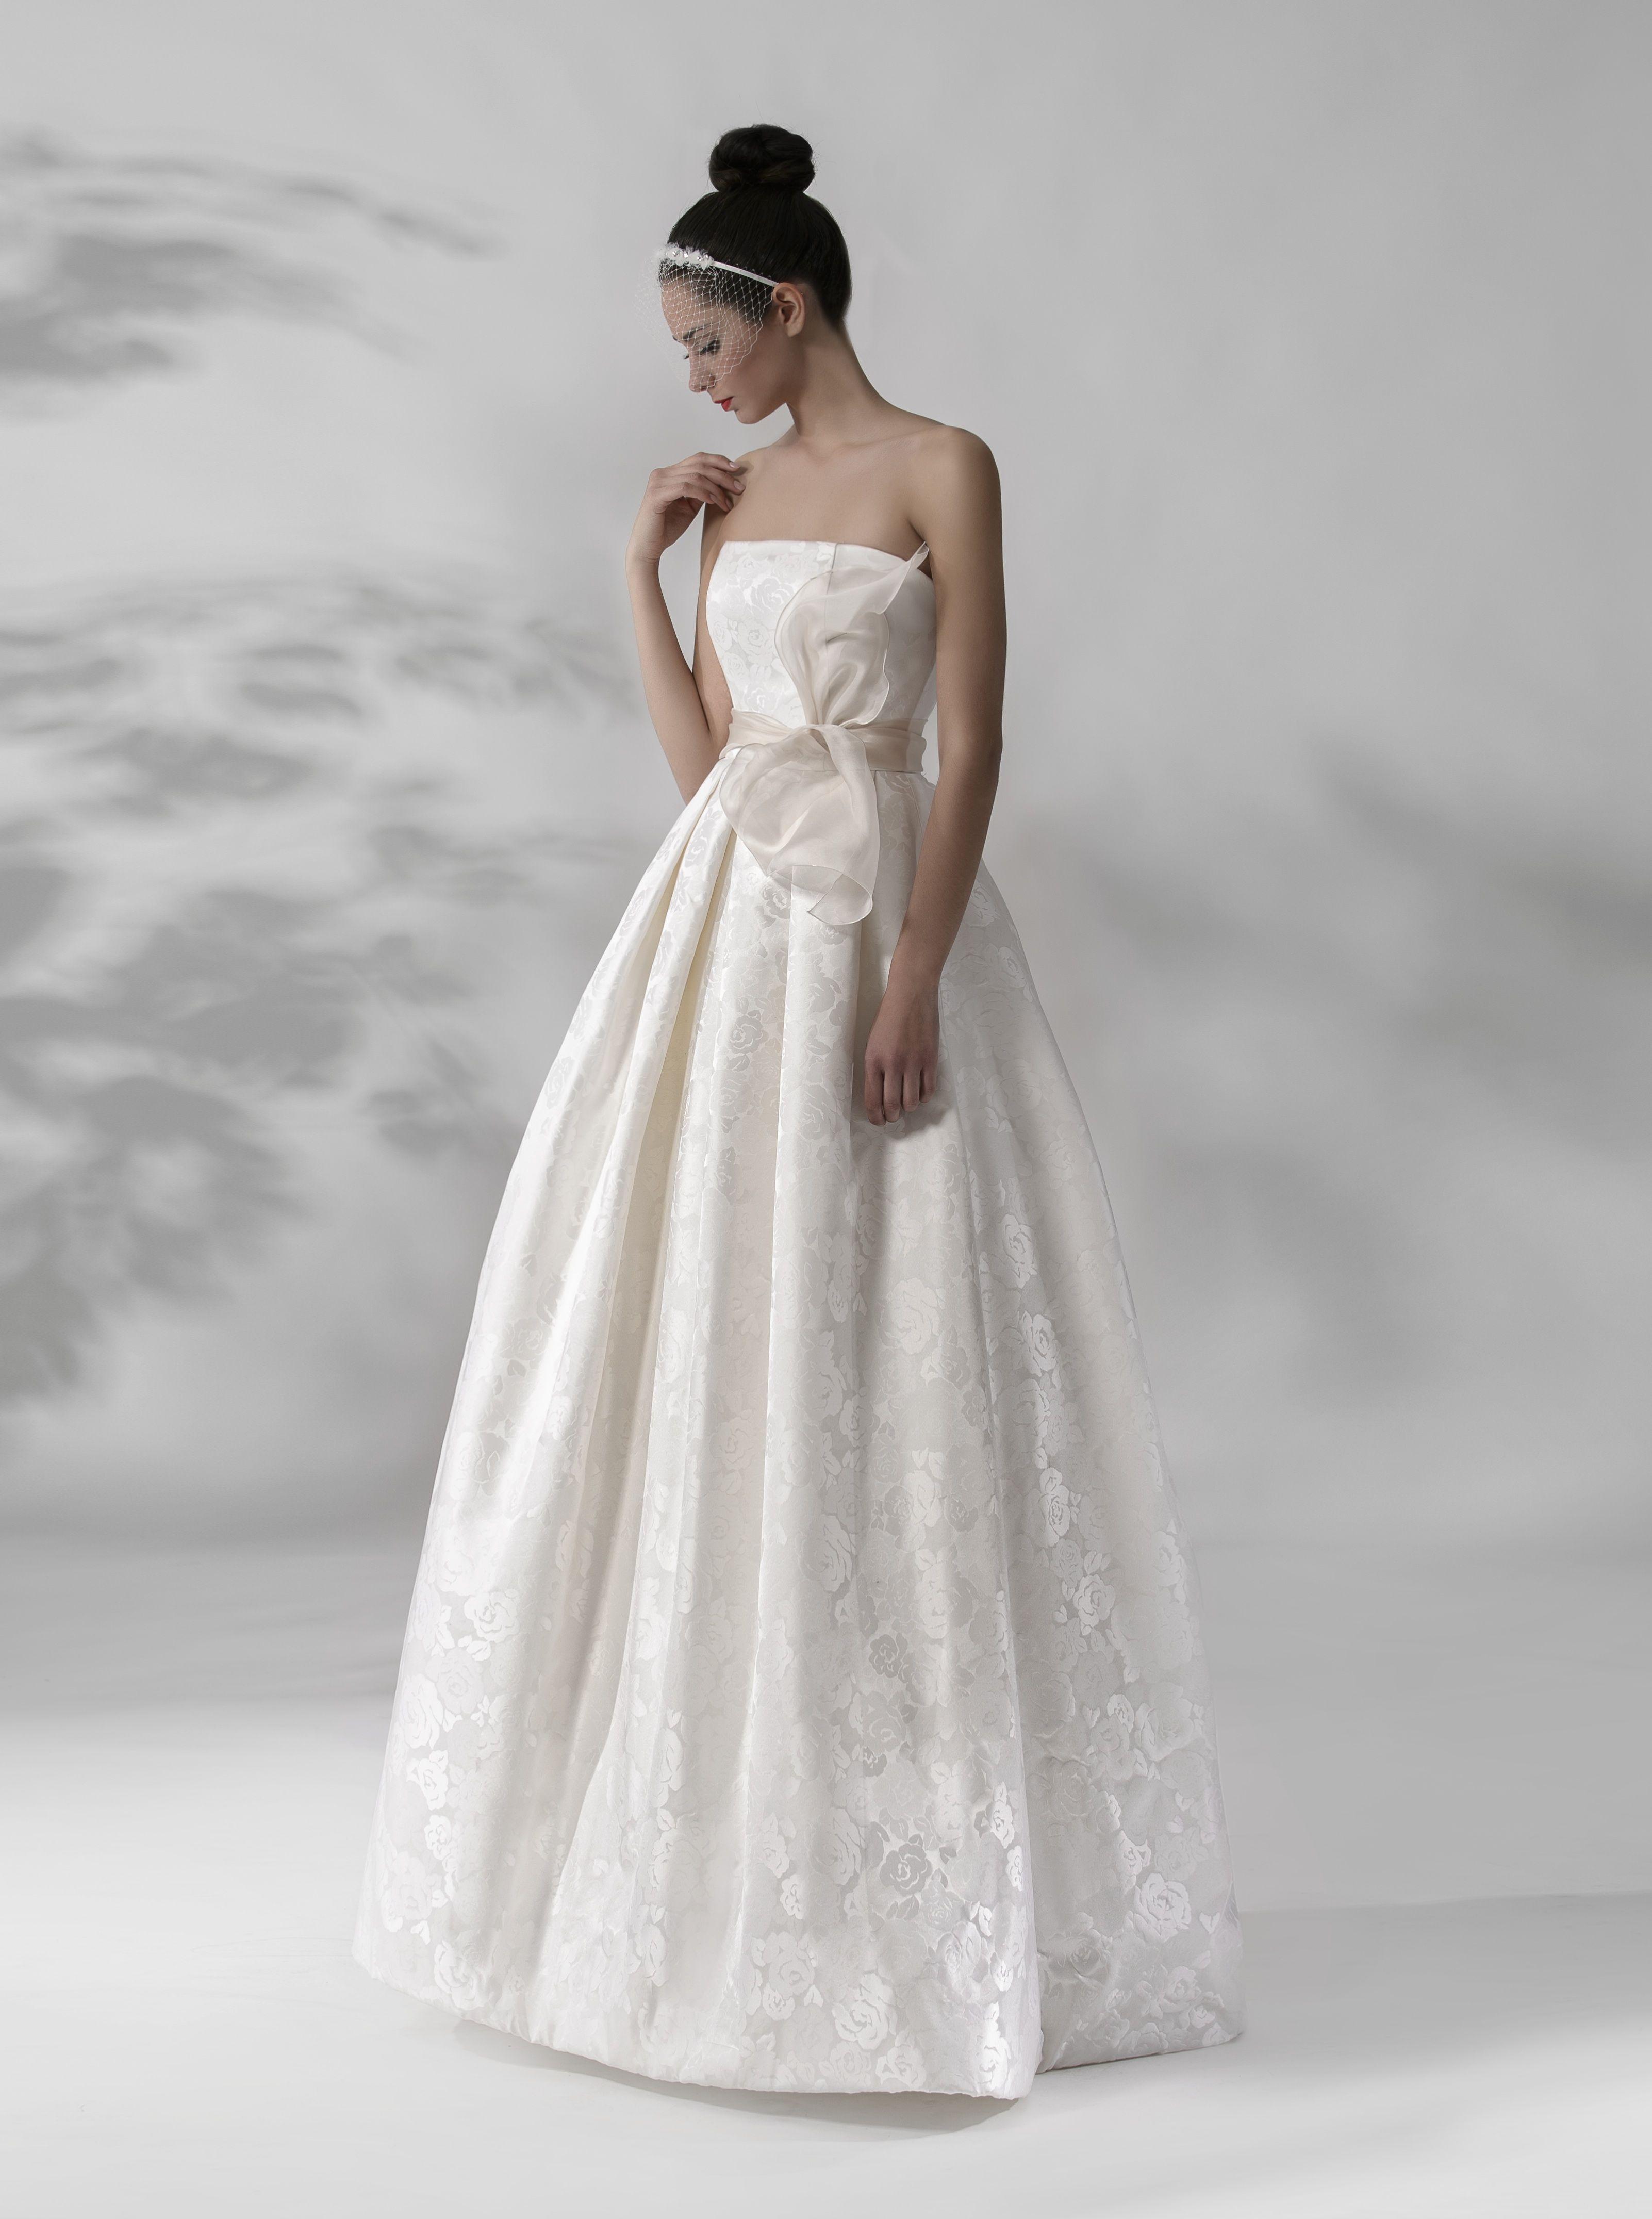 Romantic dress <3